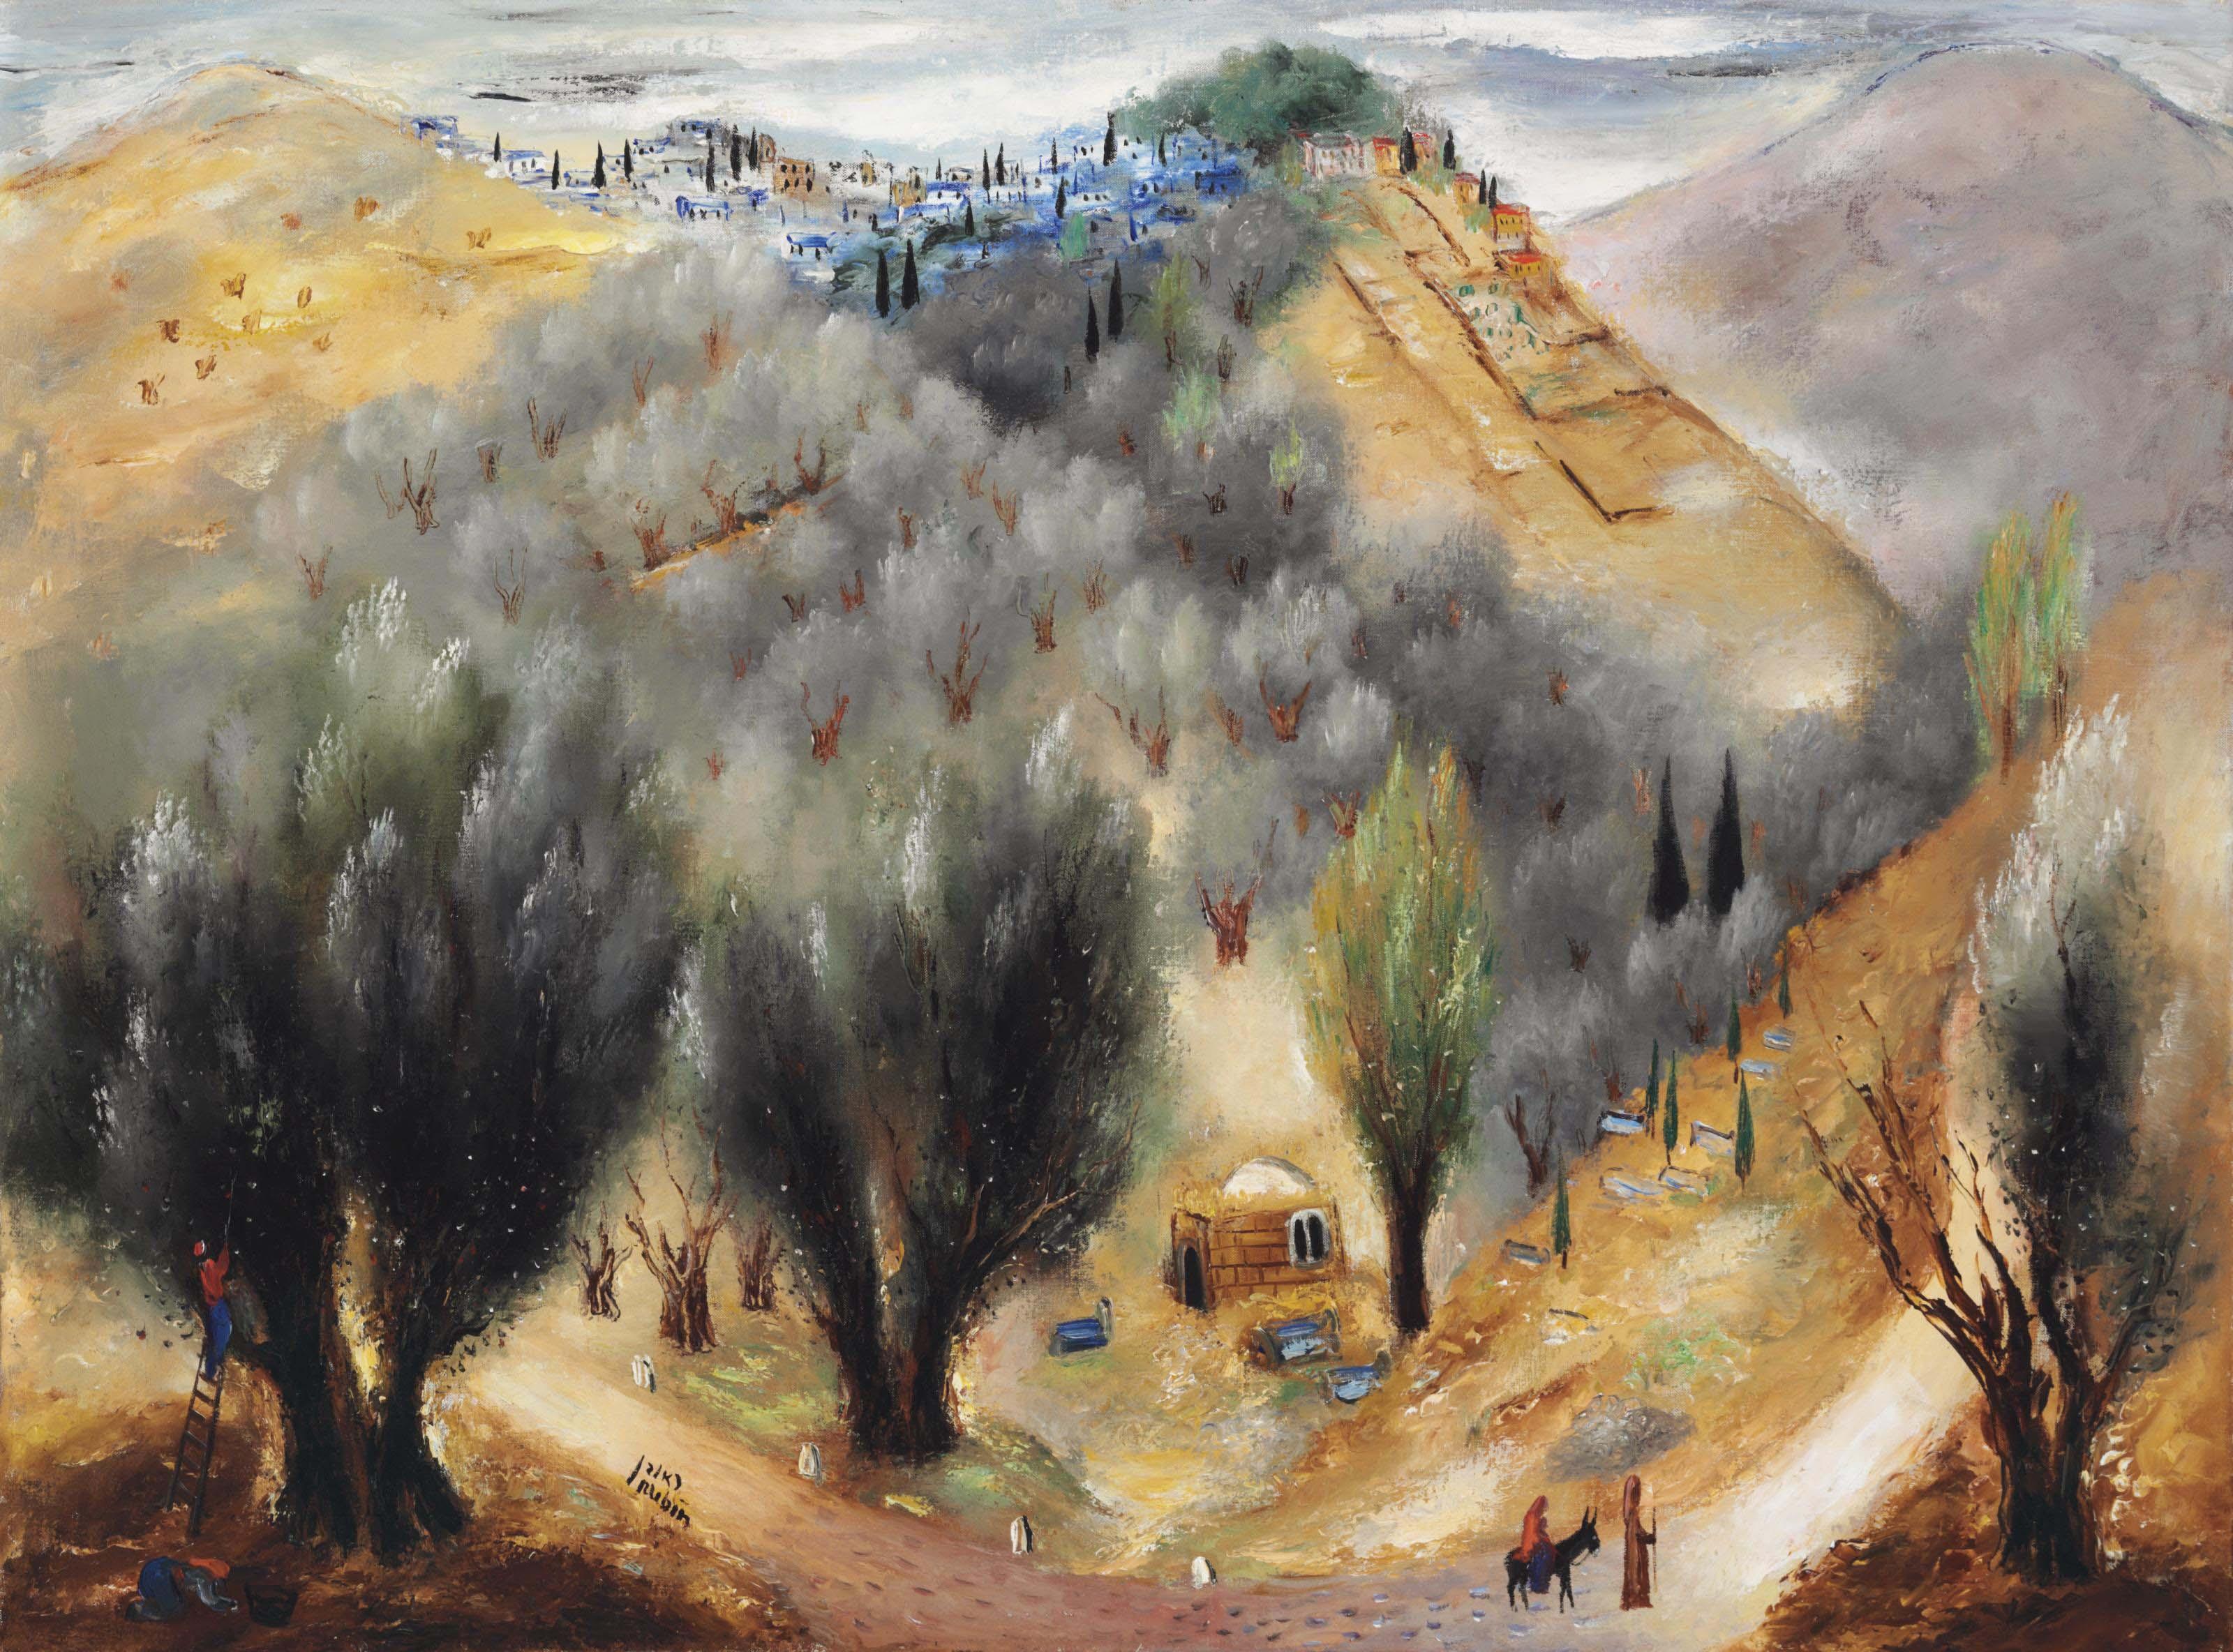 Reuven Rubin (1893-1974)